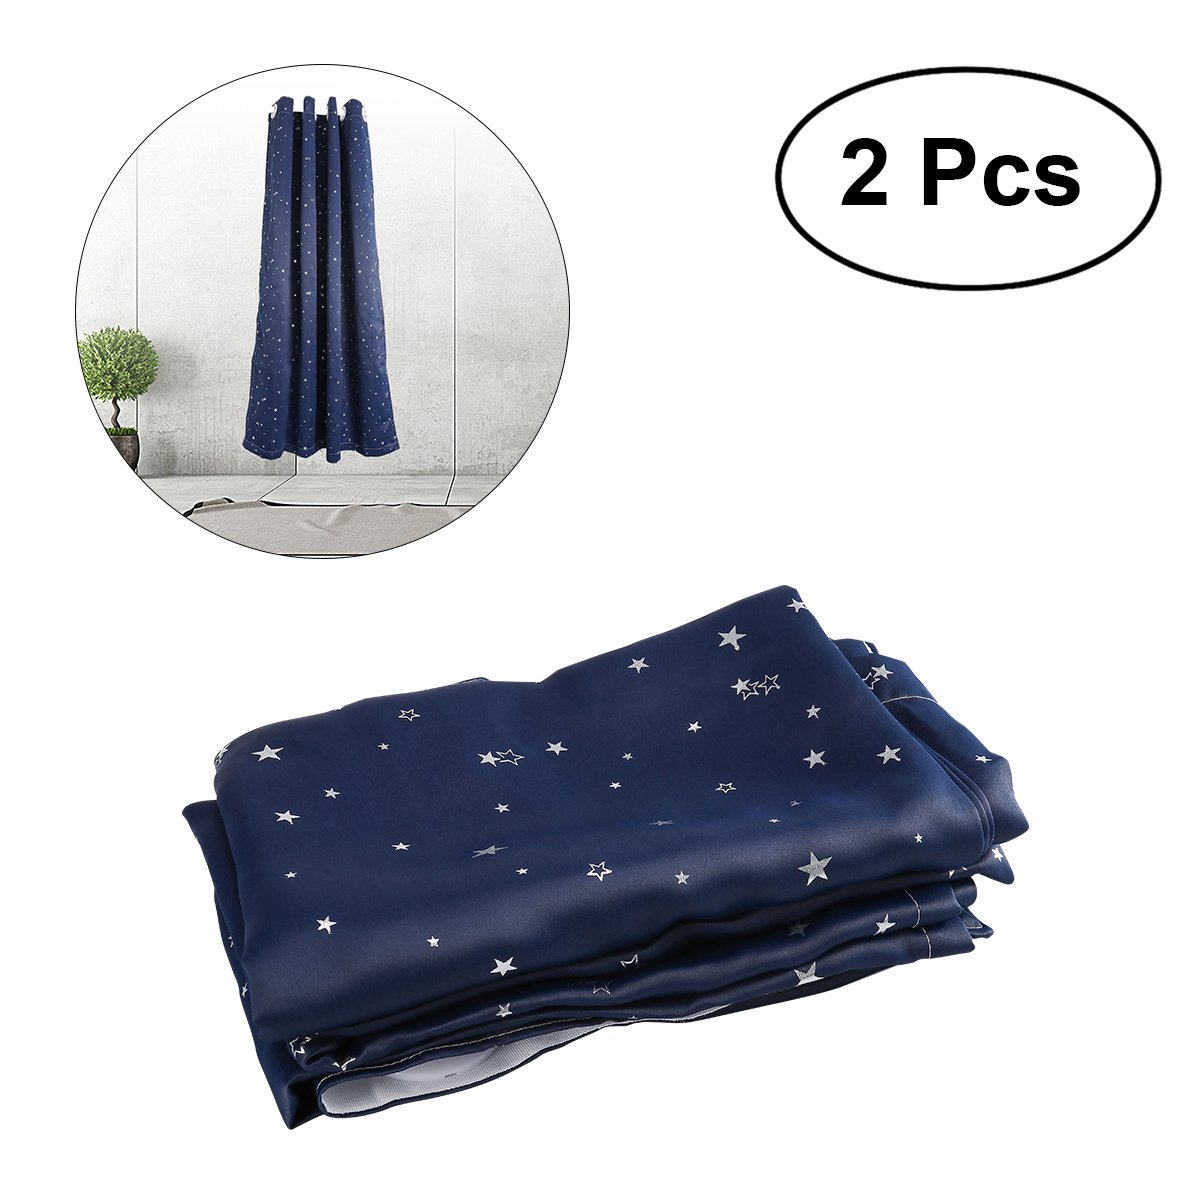 WINOMO 2個入り星プリントカーテンDrapers Room Darkening Thermal Insulated Grommet Top   B07951P6PG